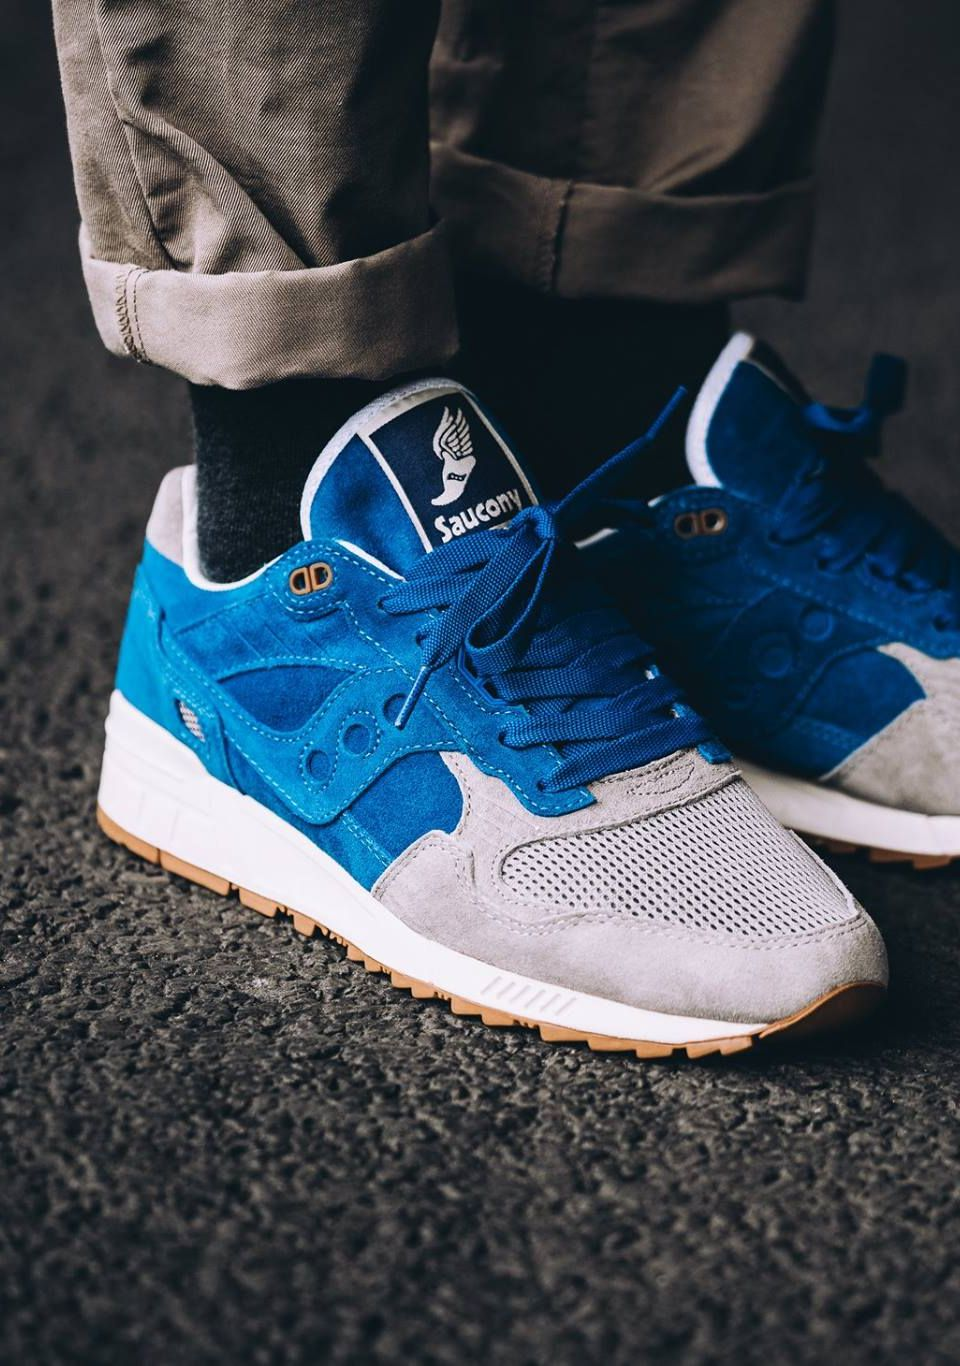 new product 7562c 1f961 Saucony Shadow 5000  sneakernews  Sneakers  StreetStyle  Kicks  adidas  nike   vans  newbalance  puma  ADIDAS  ASICS  CONVERSE  DIADORA  REEBOK  SAUCONY